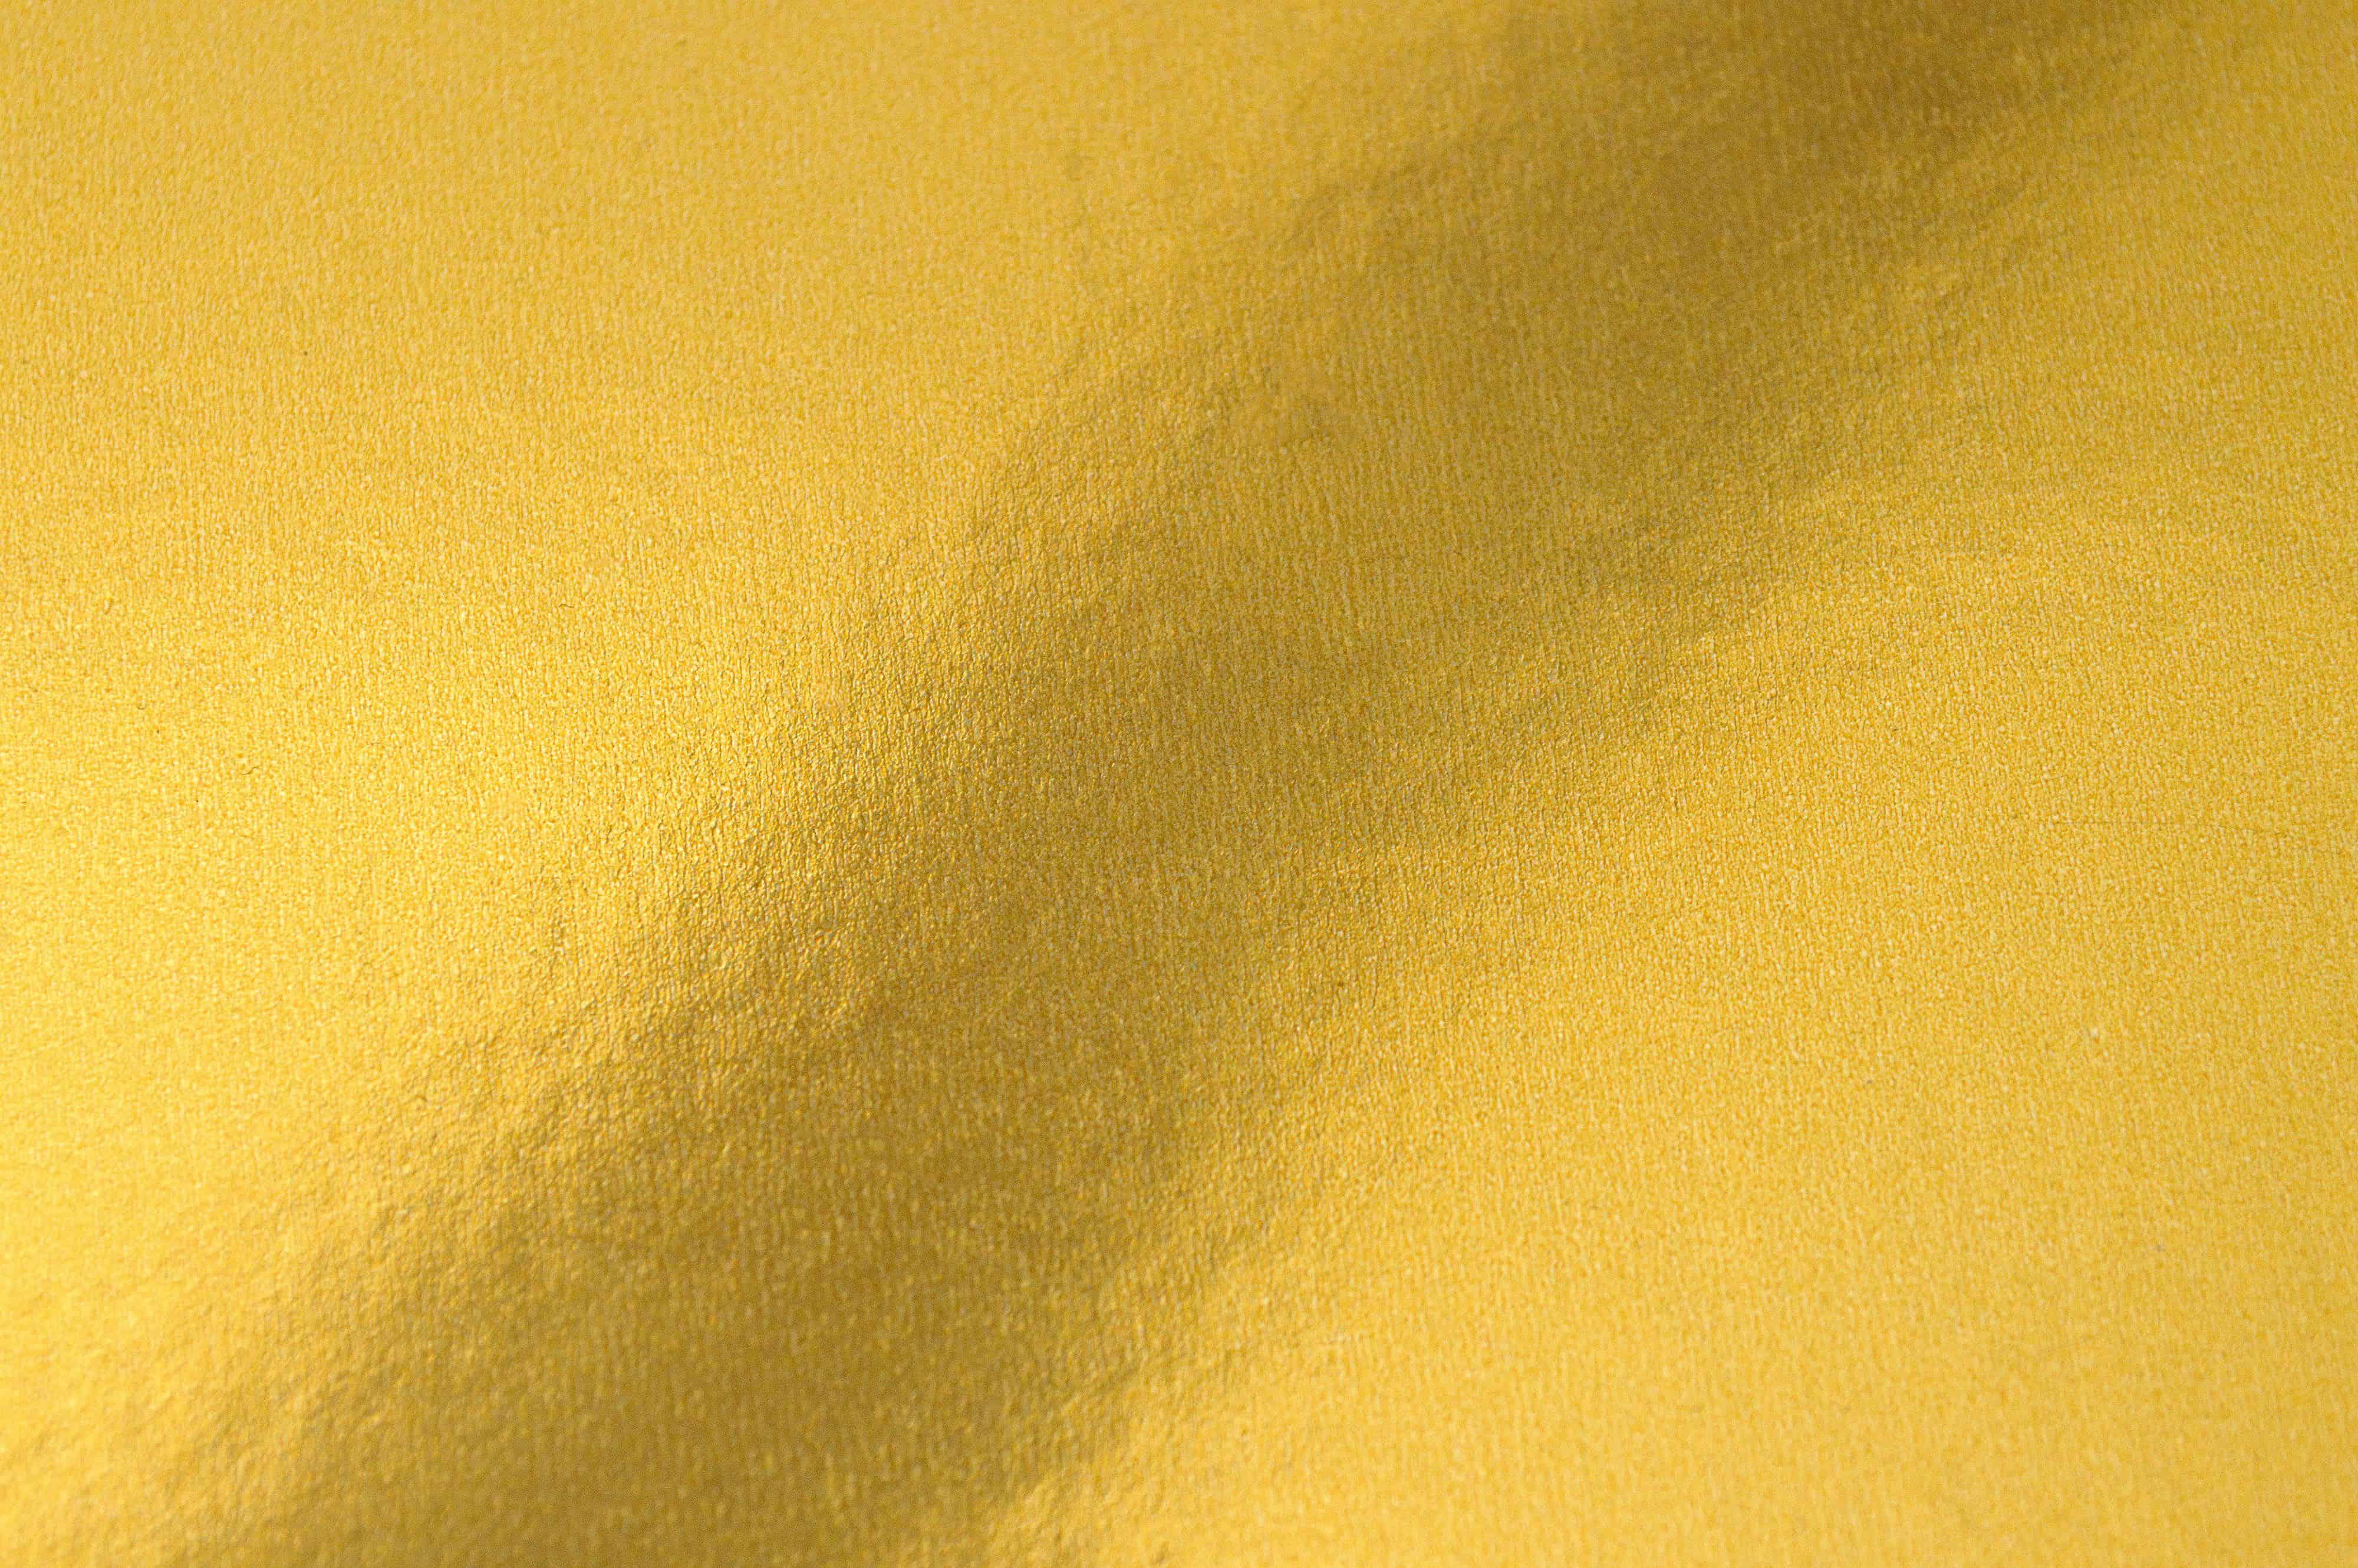 Texture | Gold